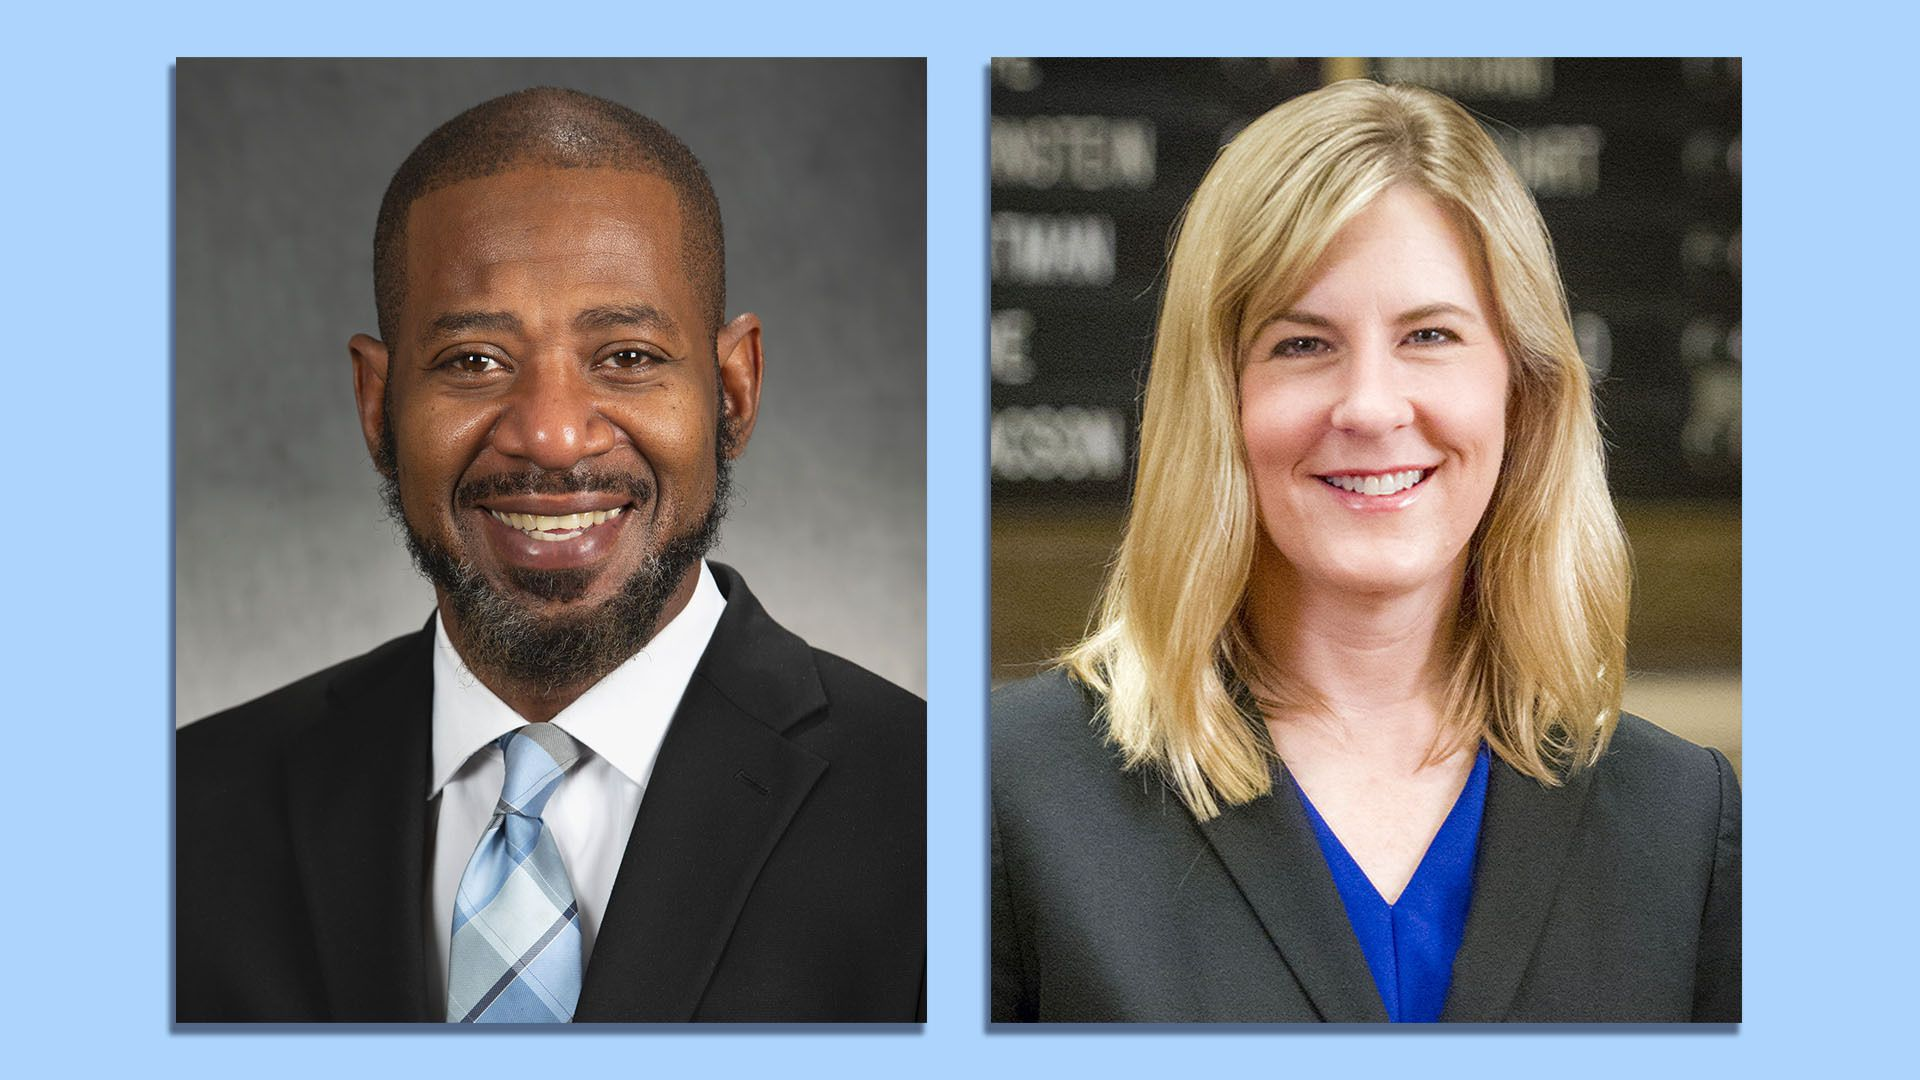 Two headshots of Minnesota Rep. John Thompson and House Speaker Melissa Hortman.